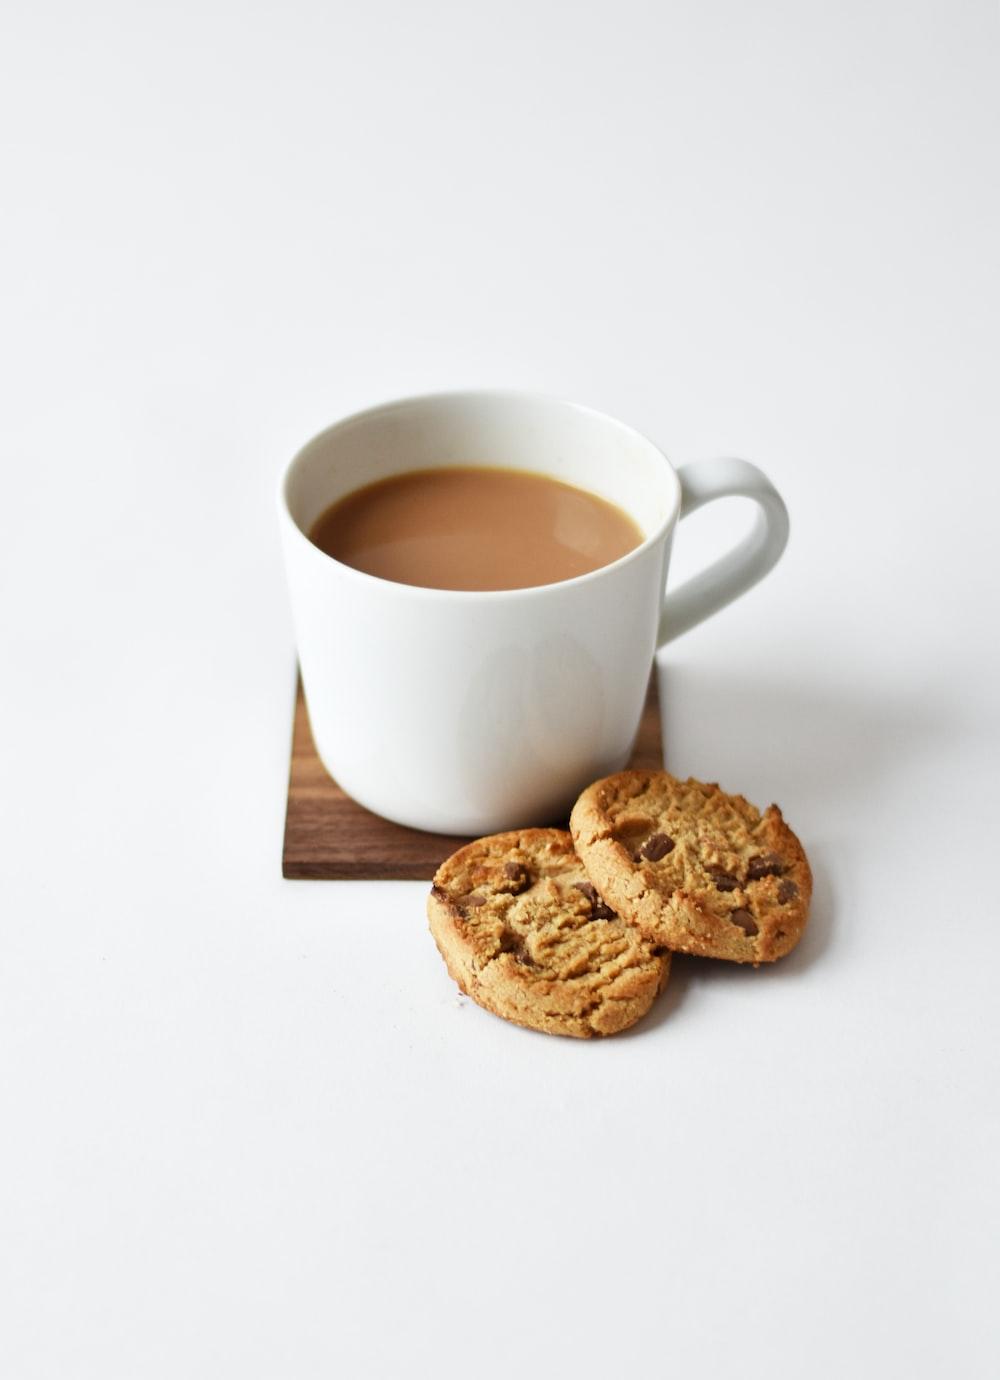 white ceramic coffee mug beside cookies